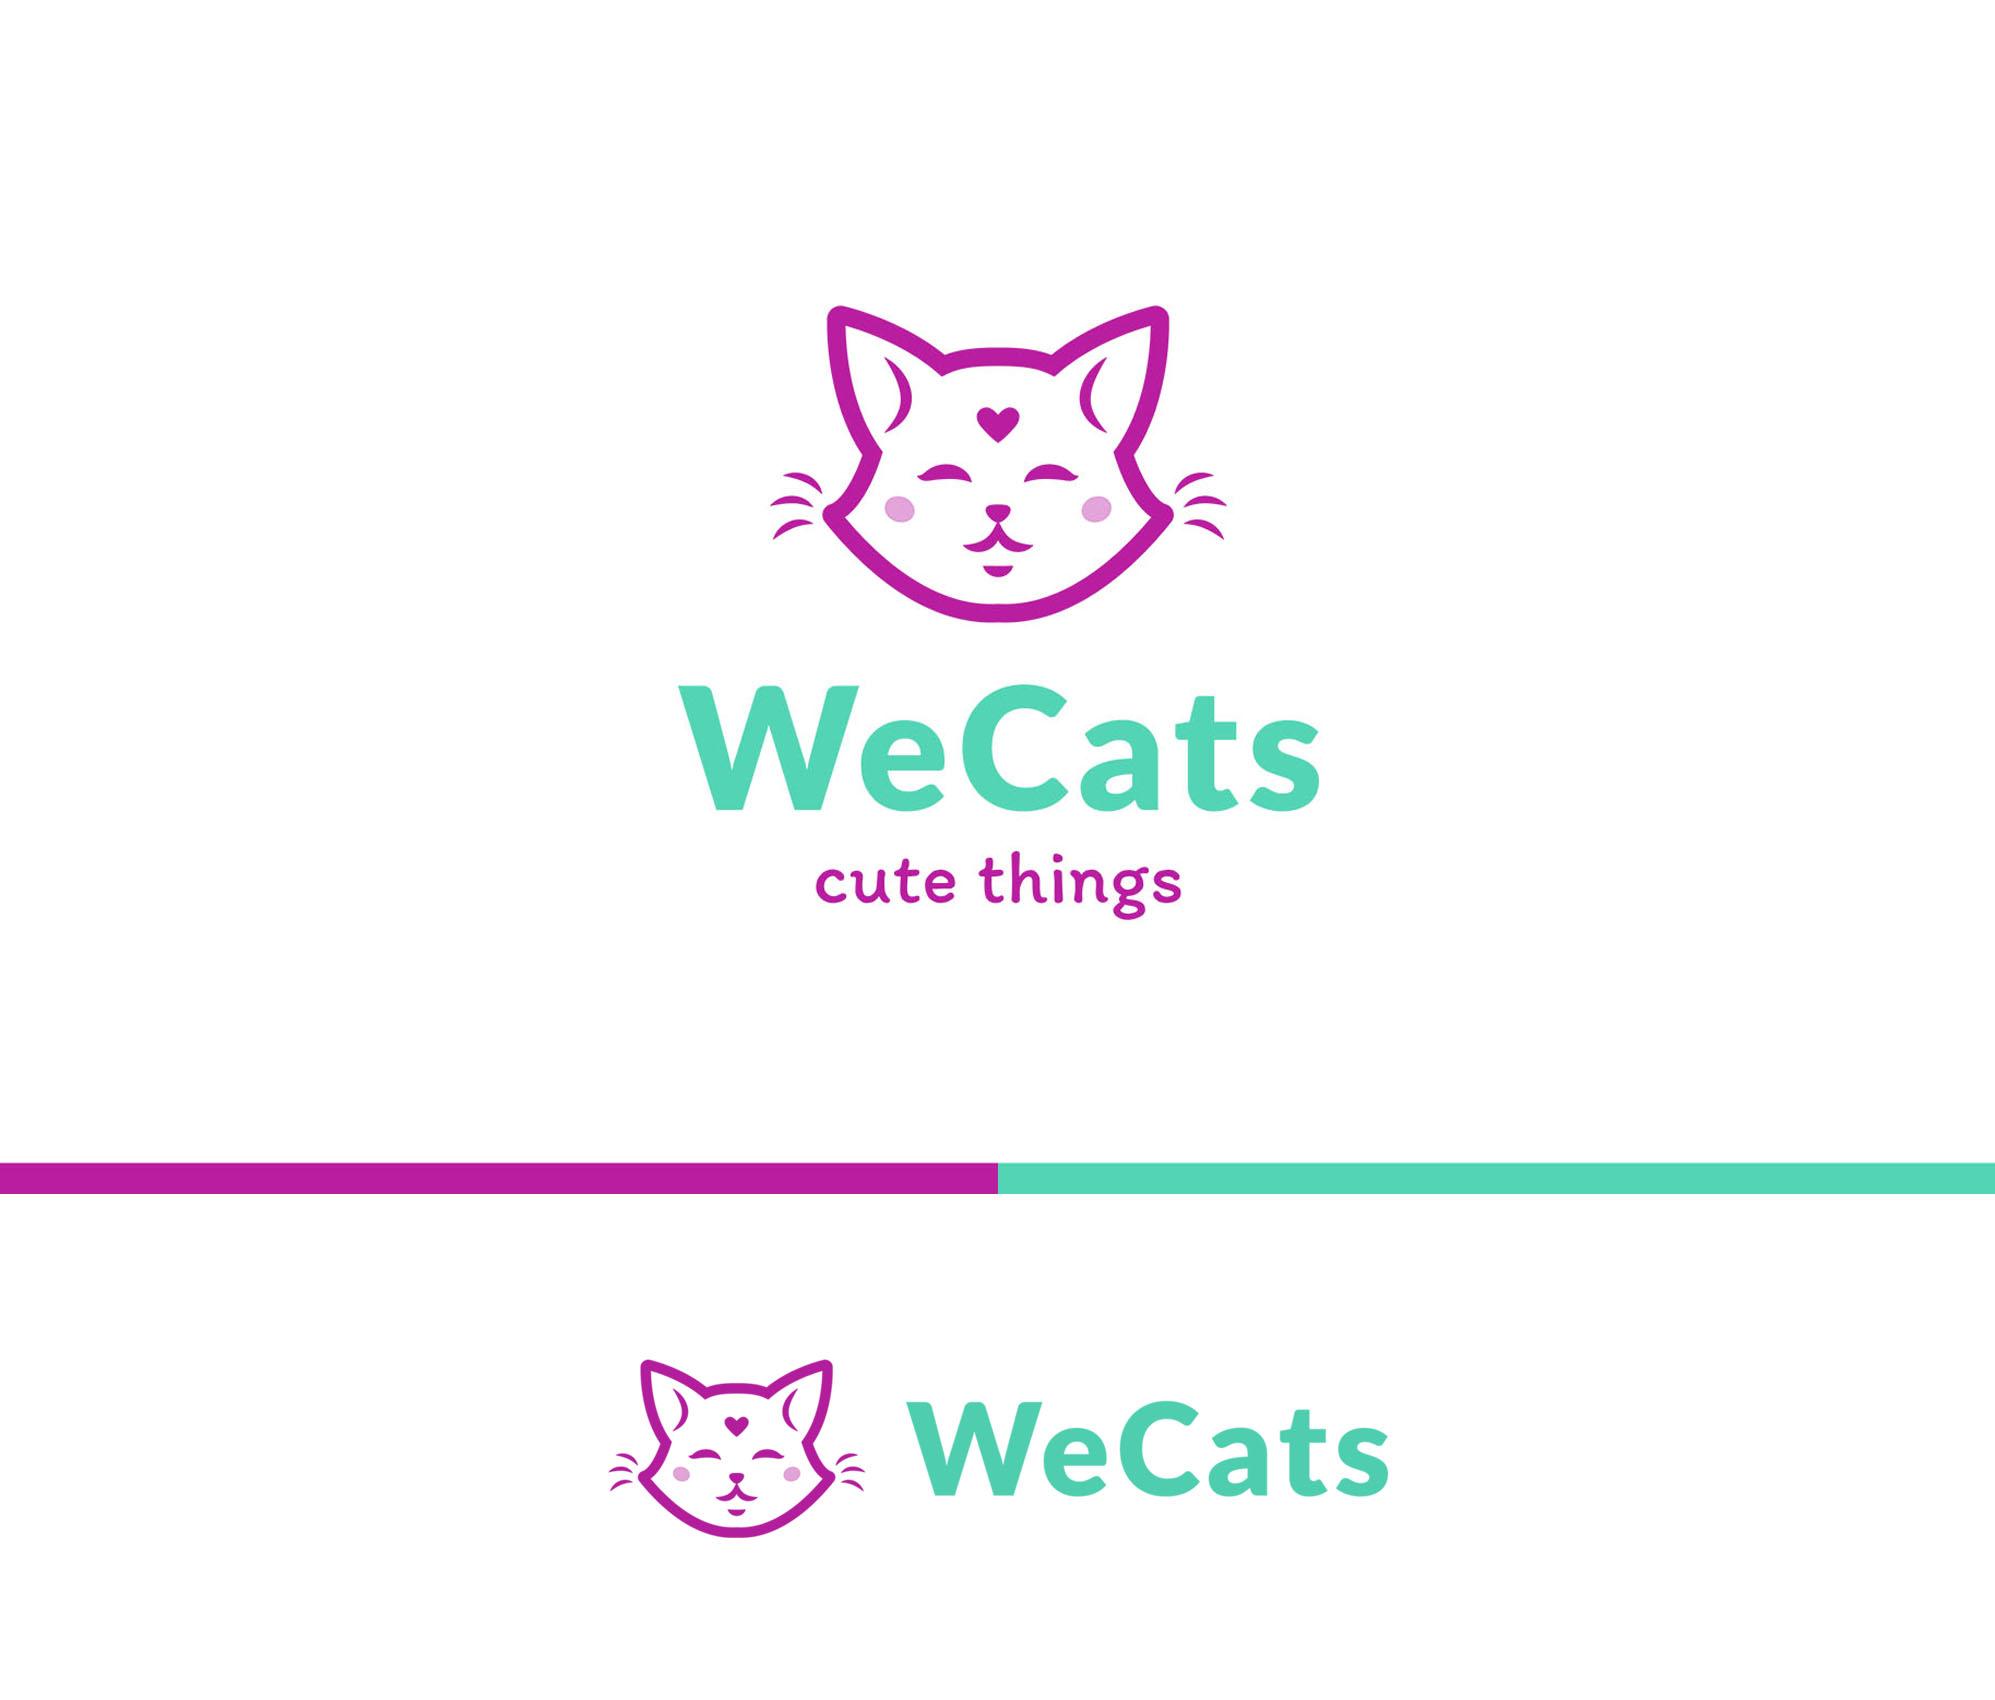 Создание логотипа WeCats фото f_3725f1daca5767f0.jpg